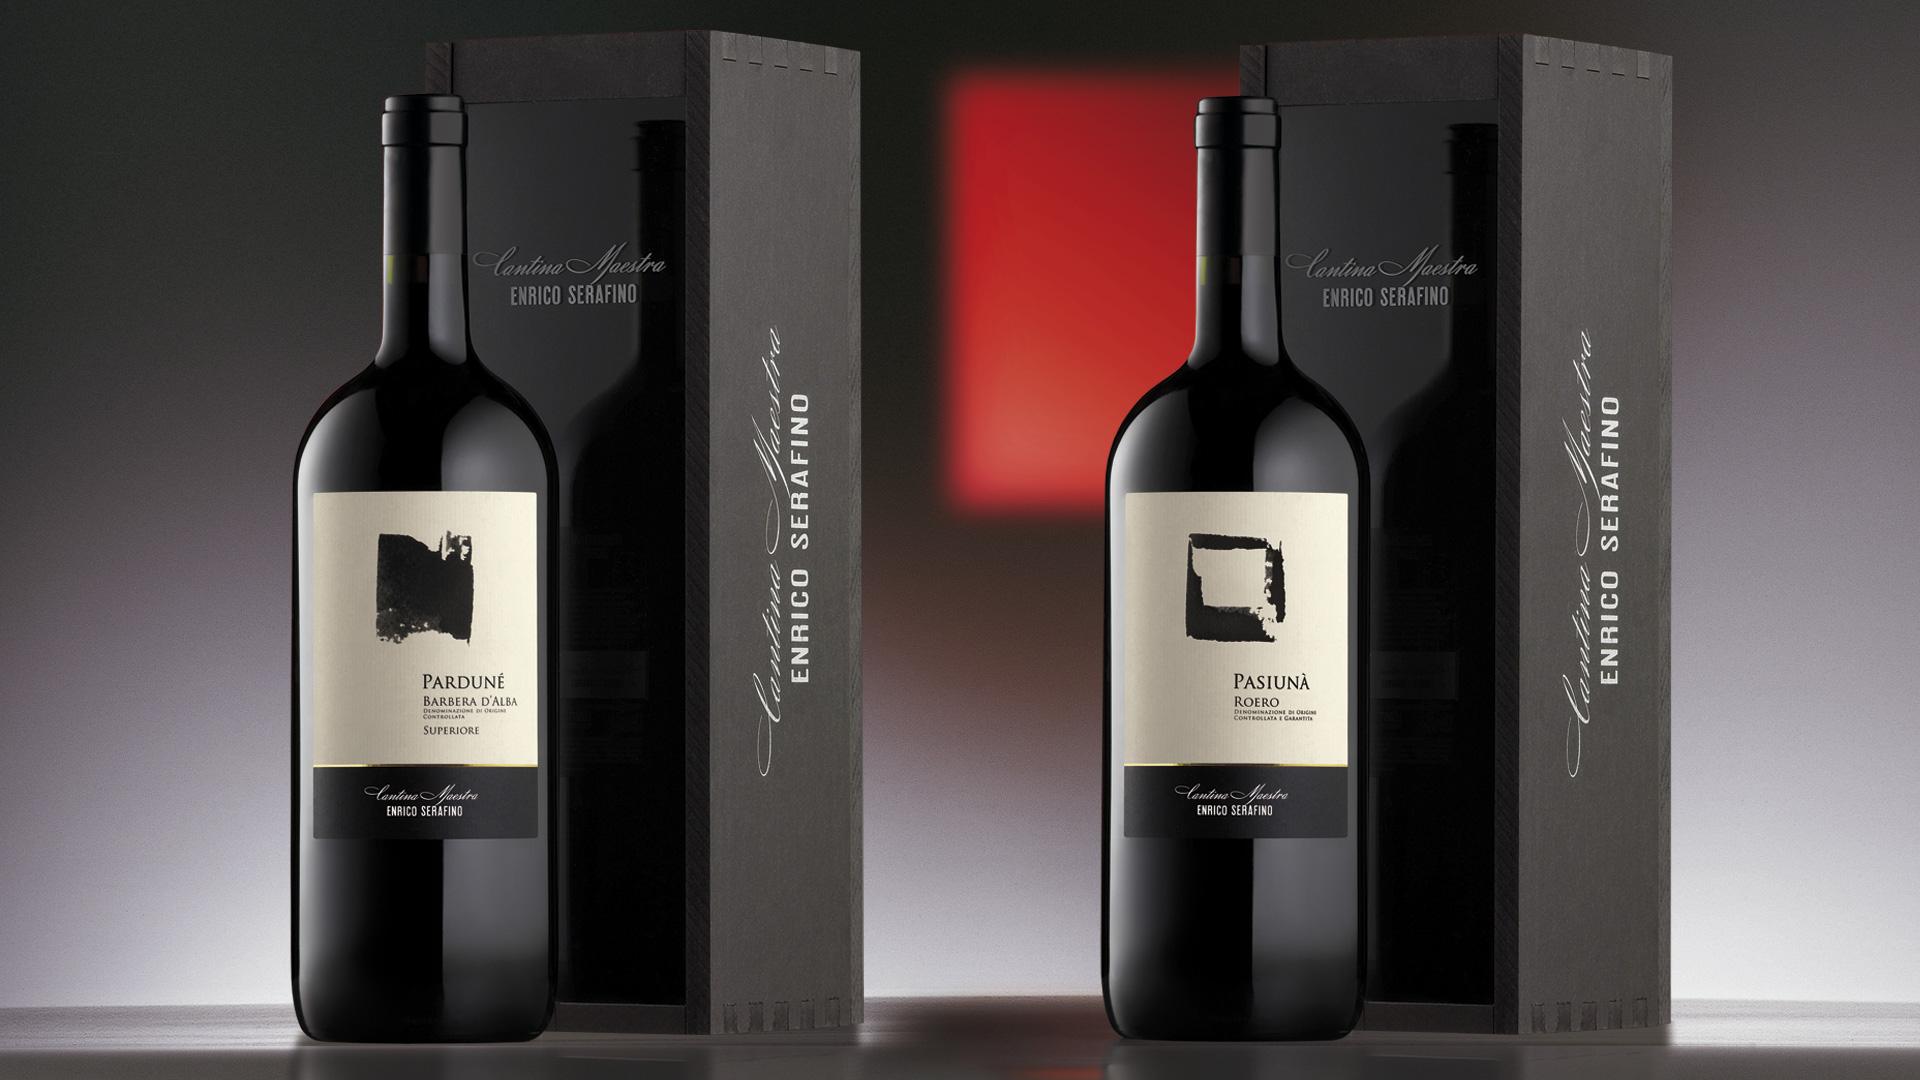 Campari Wines Enrico Serafino packaging Classici Top